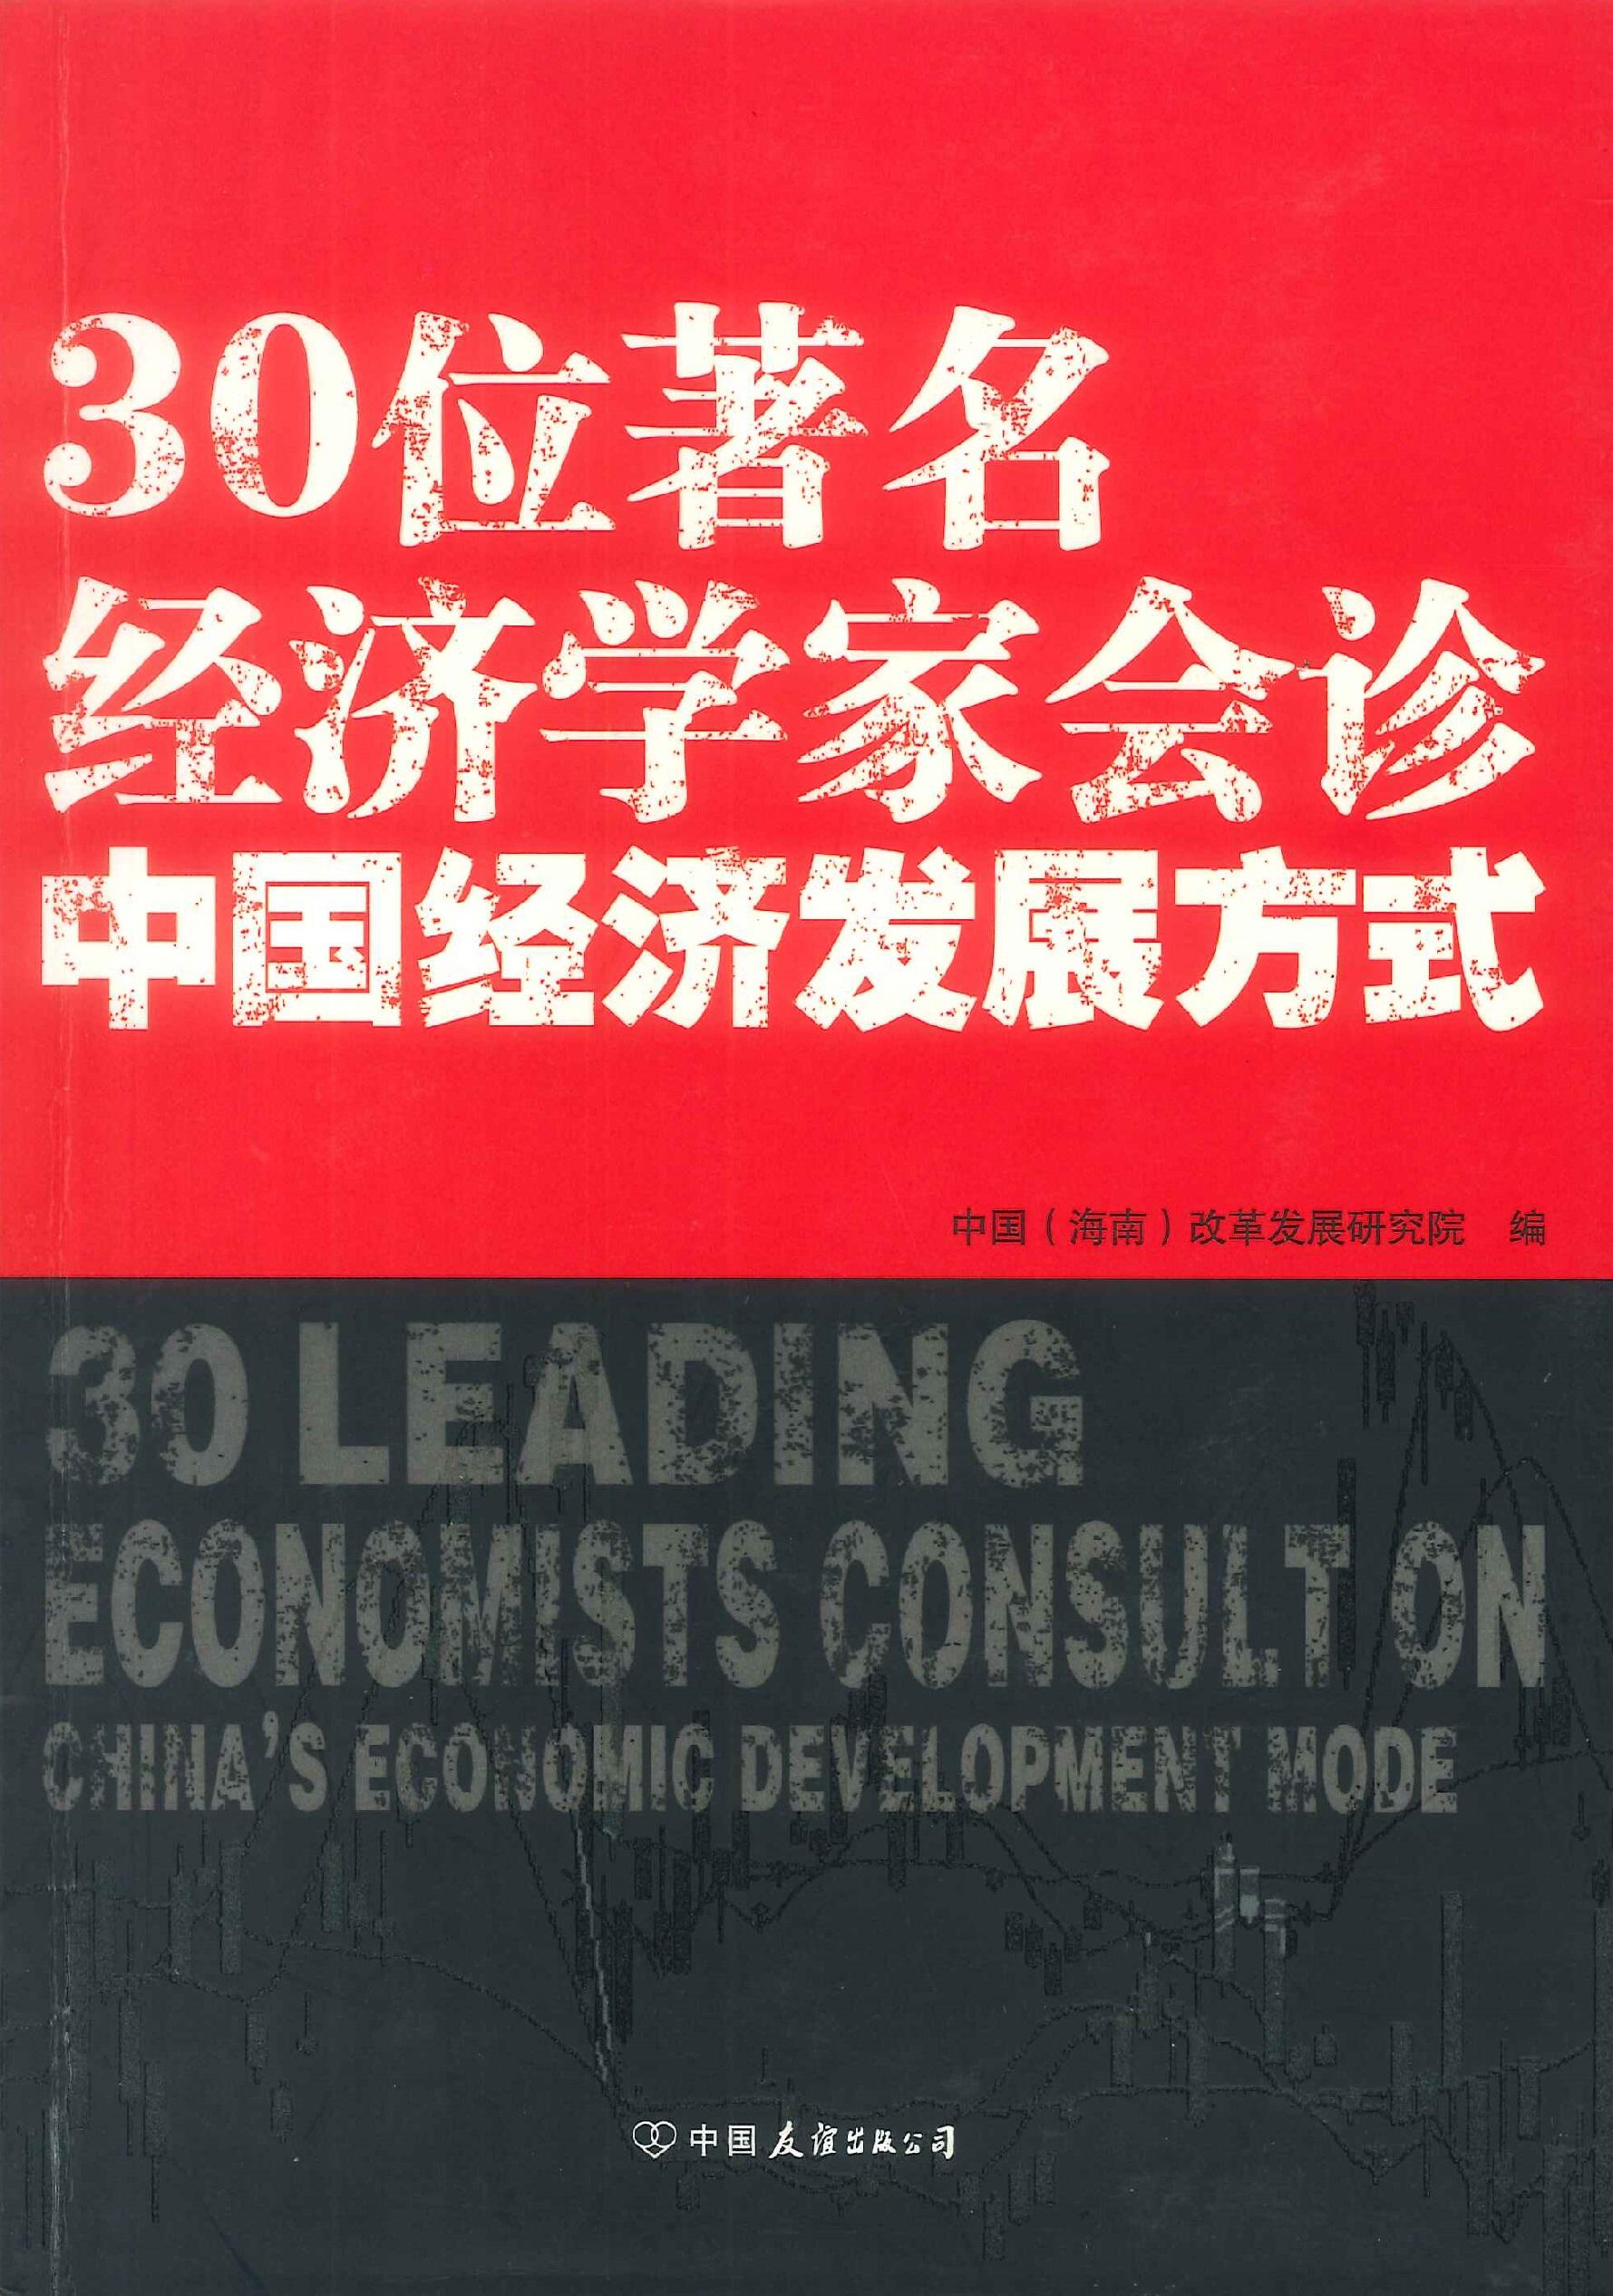 30位著名经济学家会诊中国经济发展方式=30 leading economists consult on China